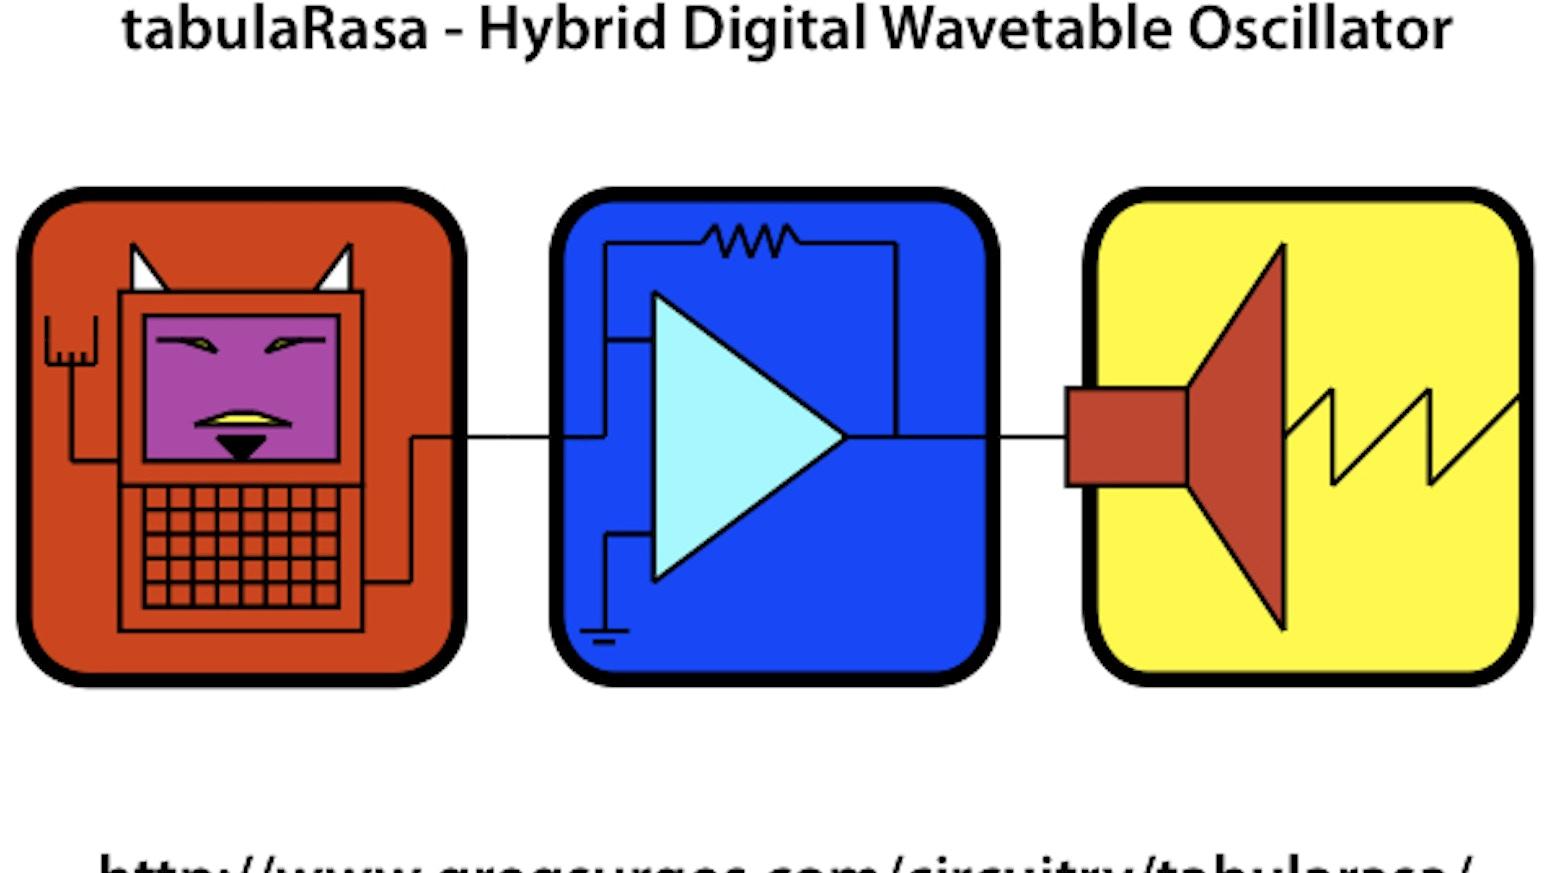 tabulaRasa - DIY Digital Wavetable Oscillator by Greg Surges